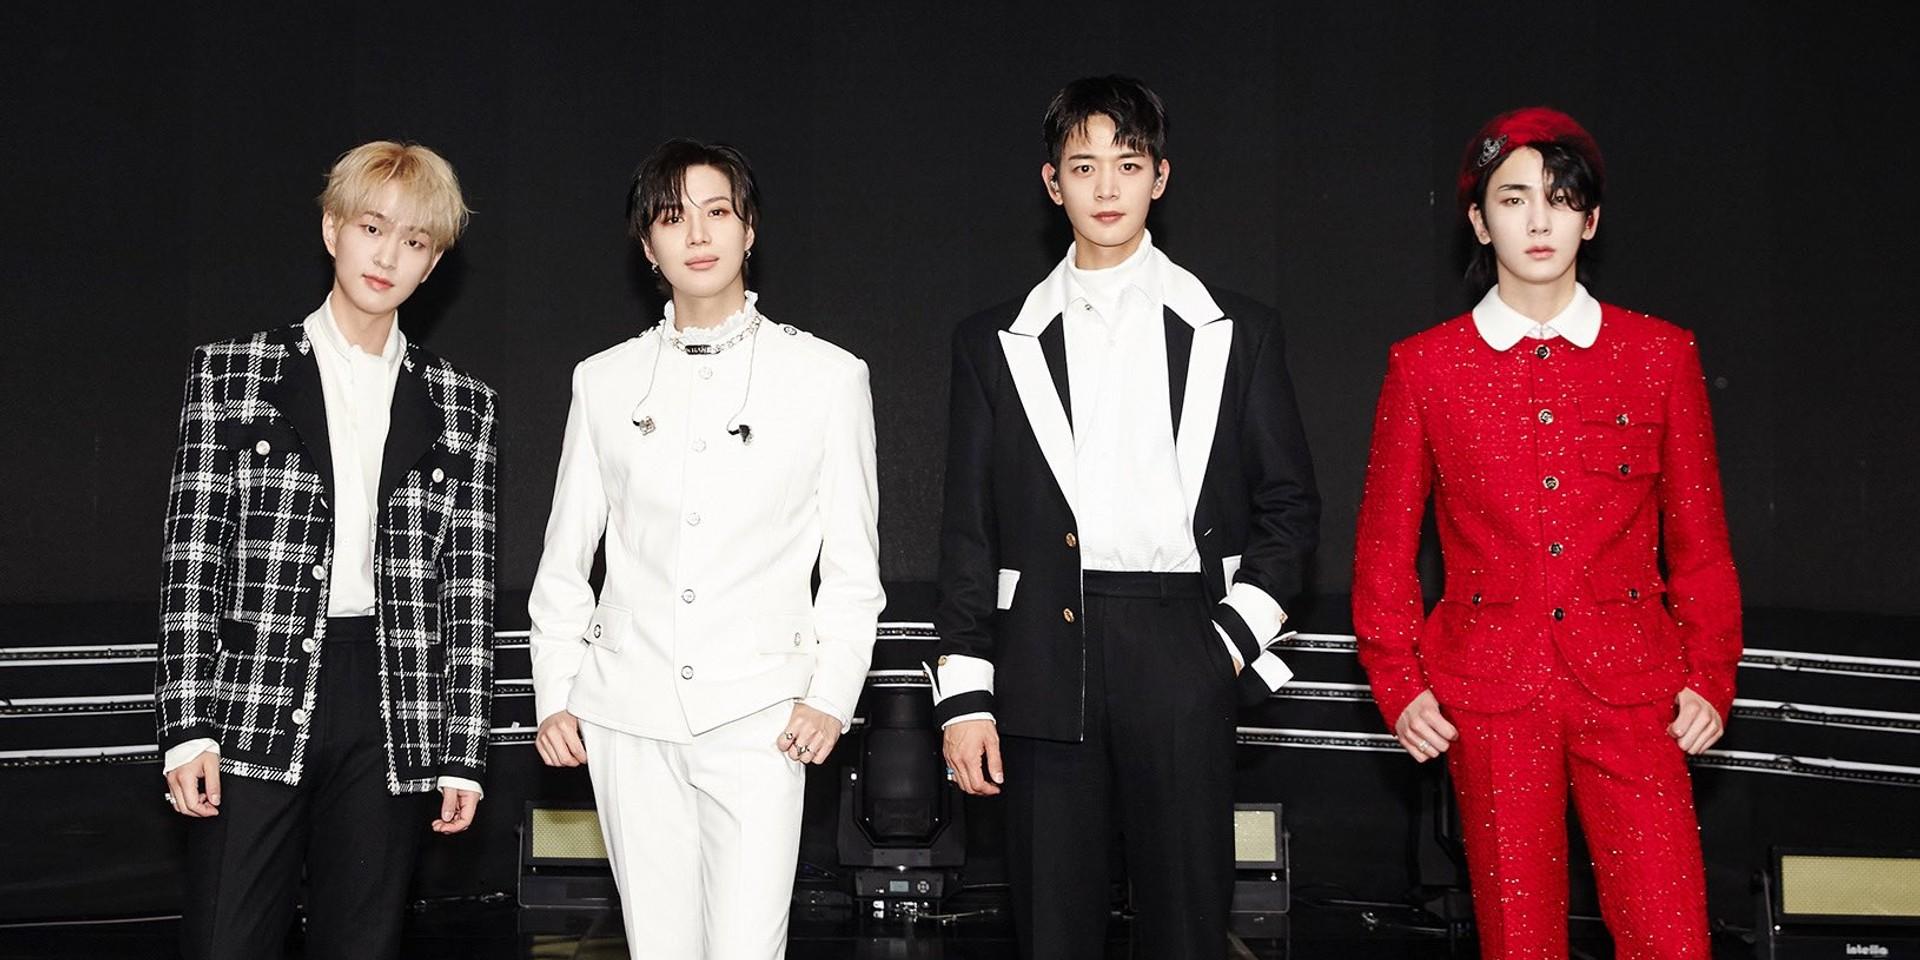 SHINee confirm new album, announce comeback show 'The Ringtone: SHINee is Back'